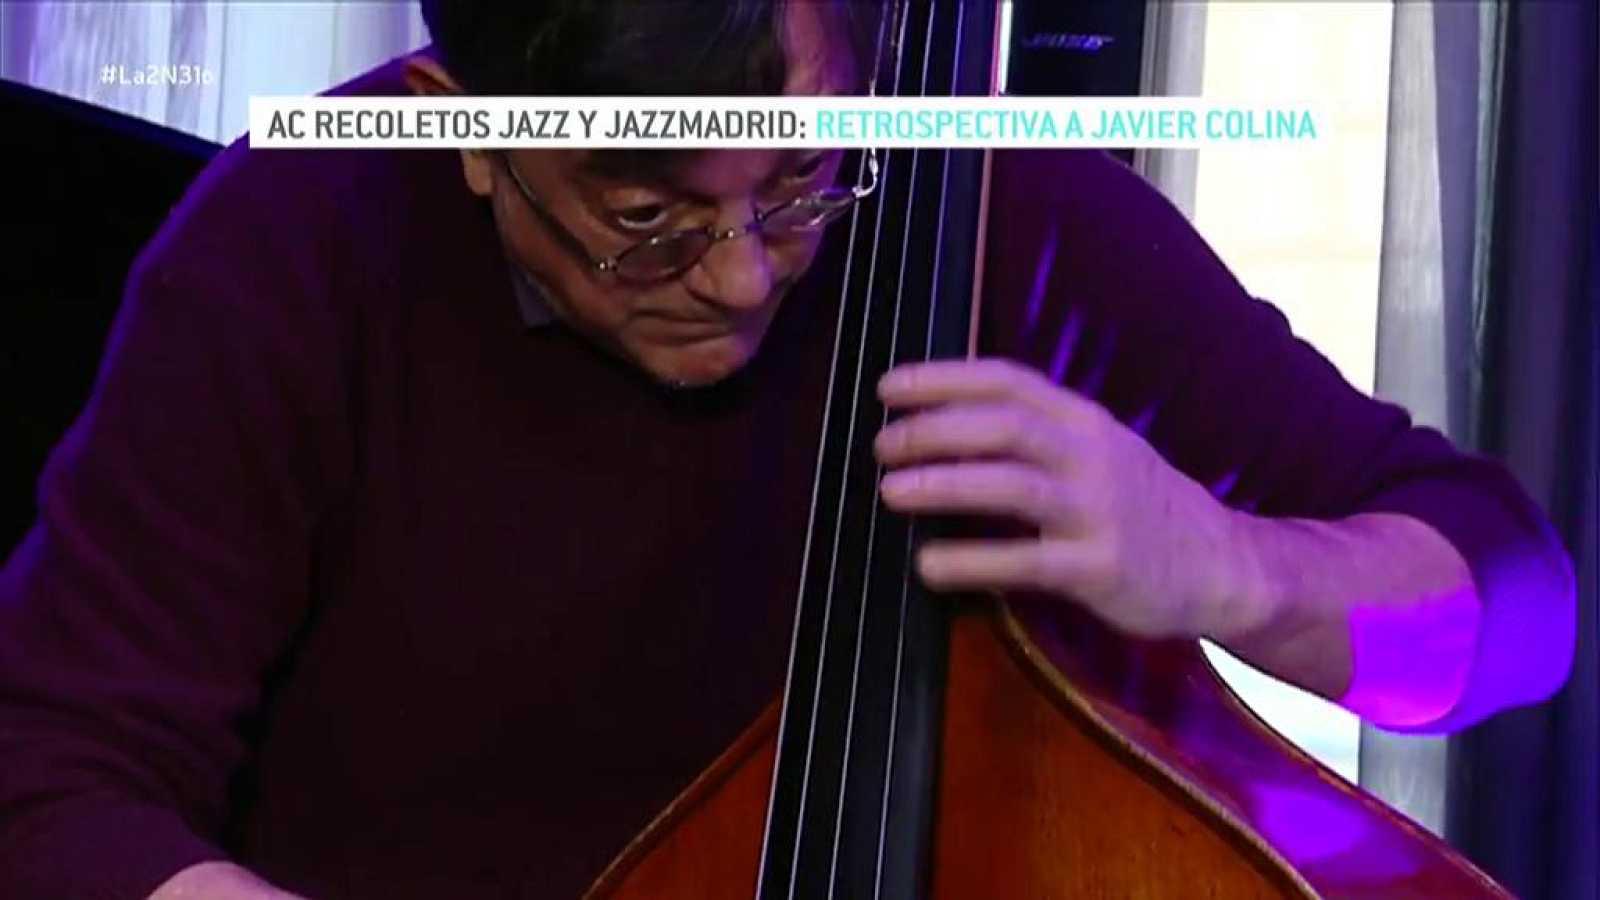 AC Recoletos Jazz y Jazzmadrid: retrospectiva a Javier Colina